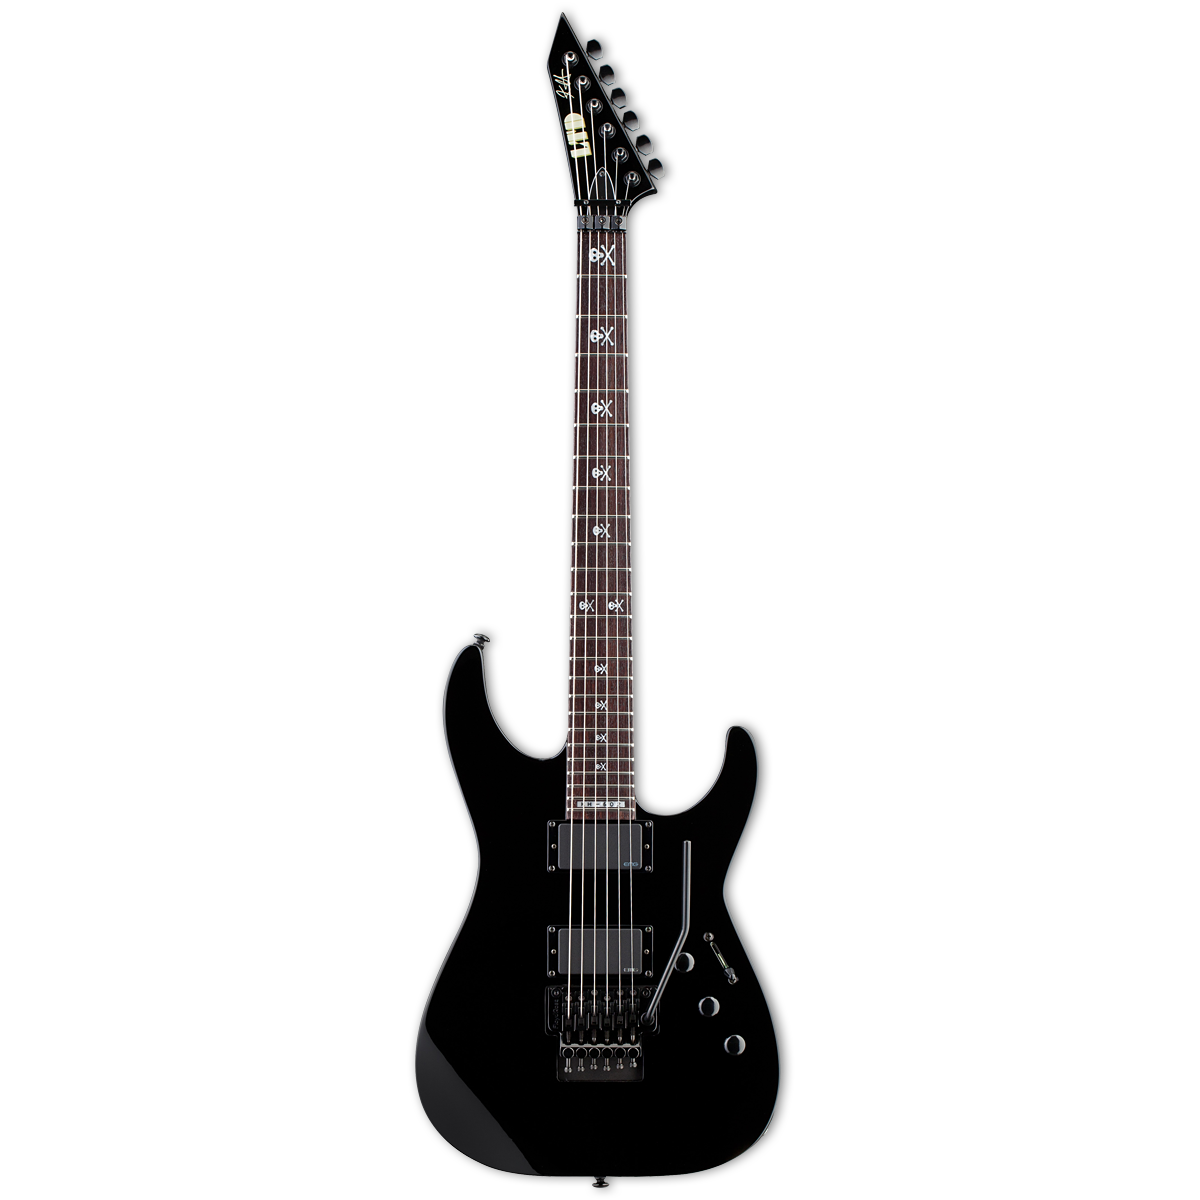 esp ltd kh602 kirk hammett electric guitar black musical instruments. Black Bedroom Furniture Sets. Home Design Ideas